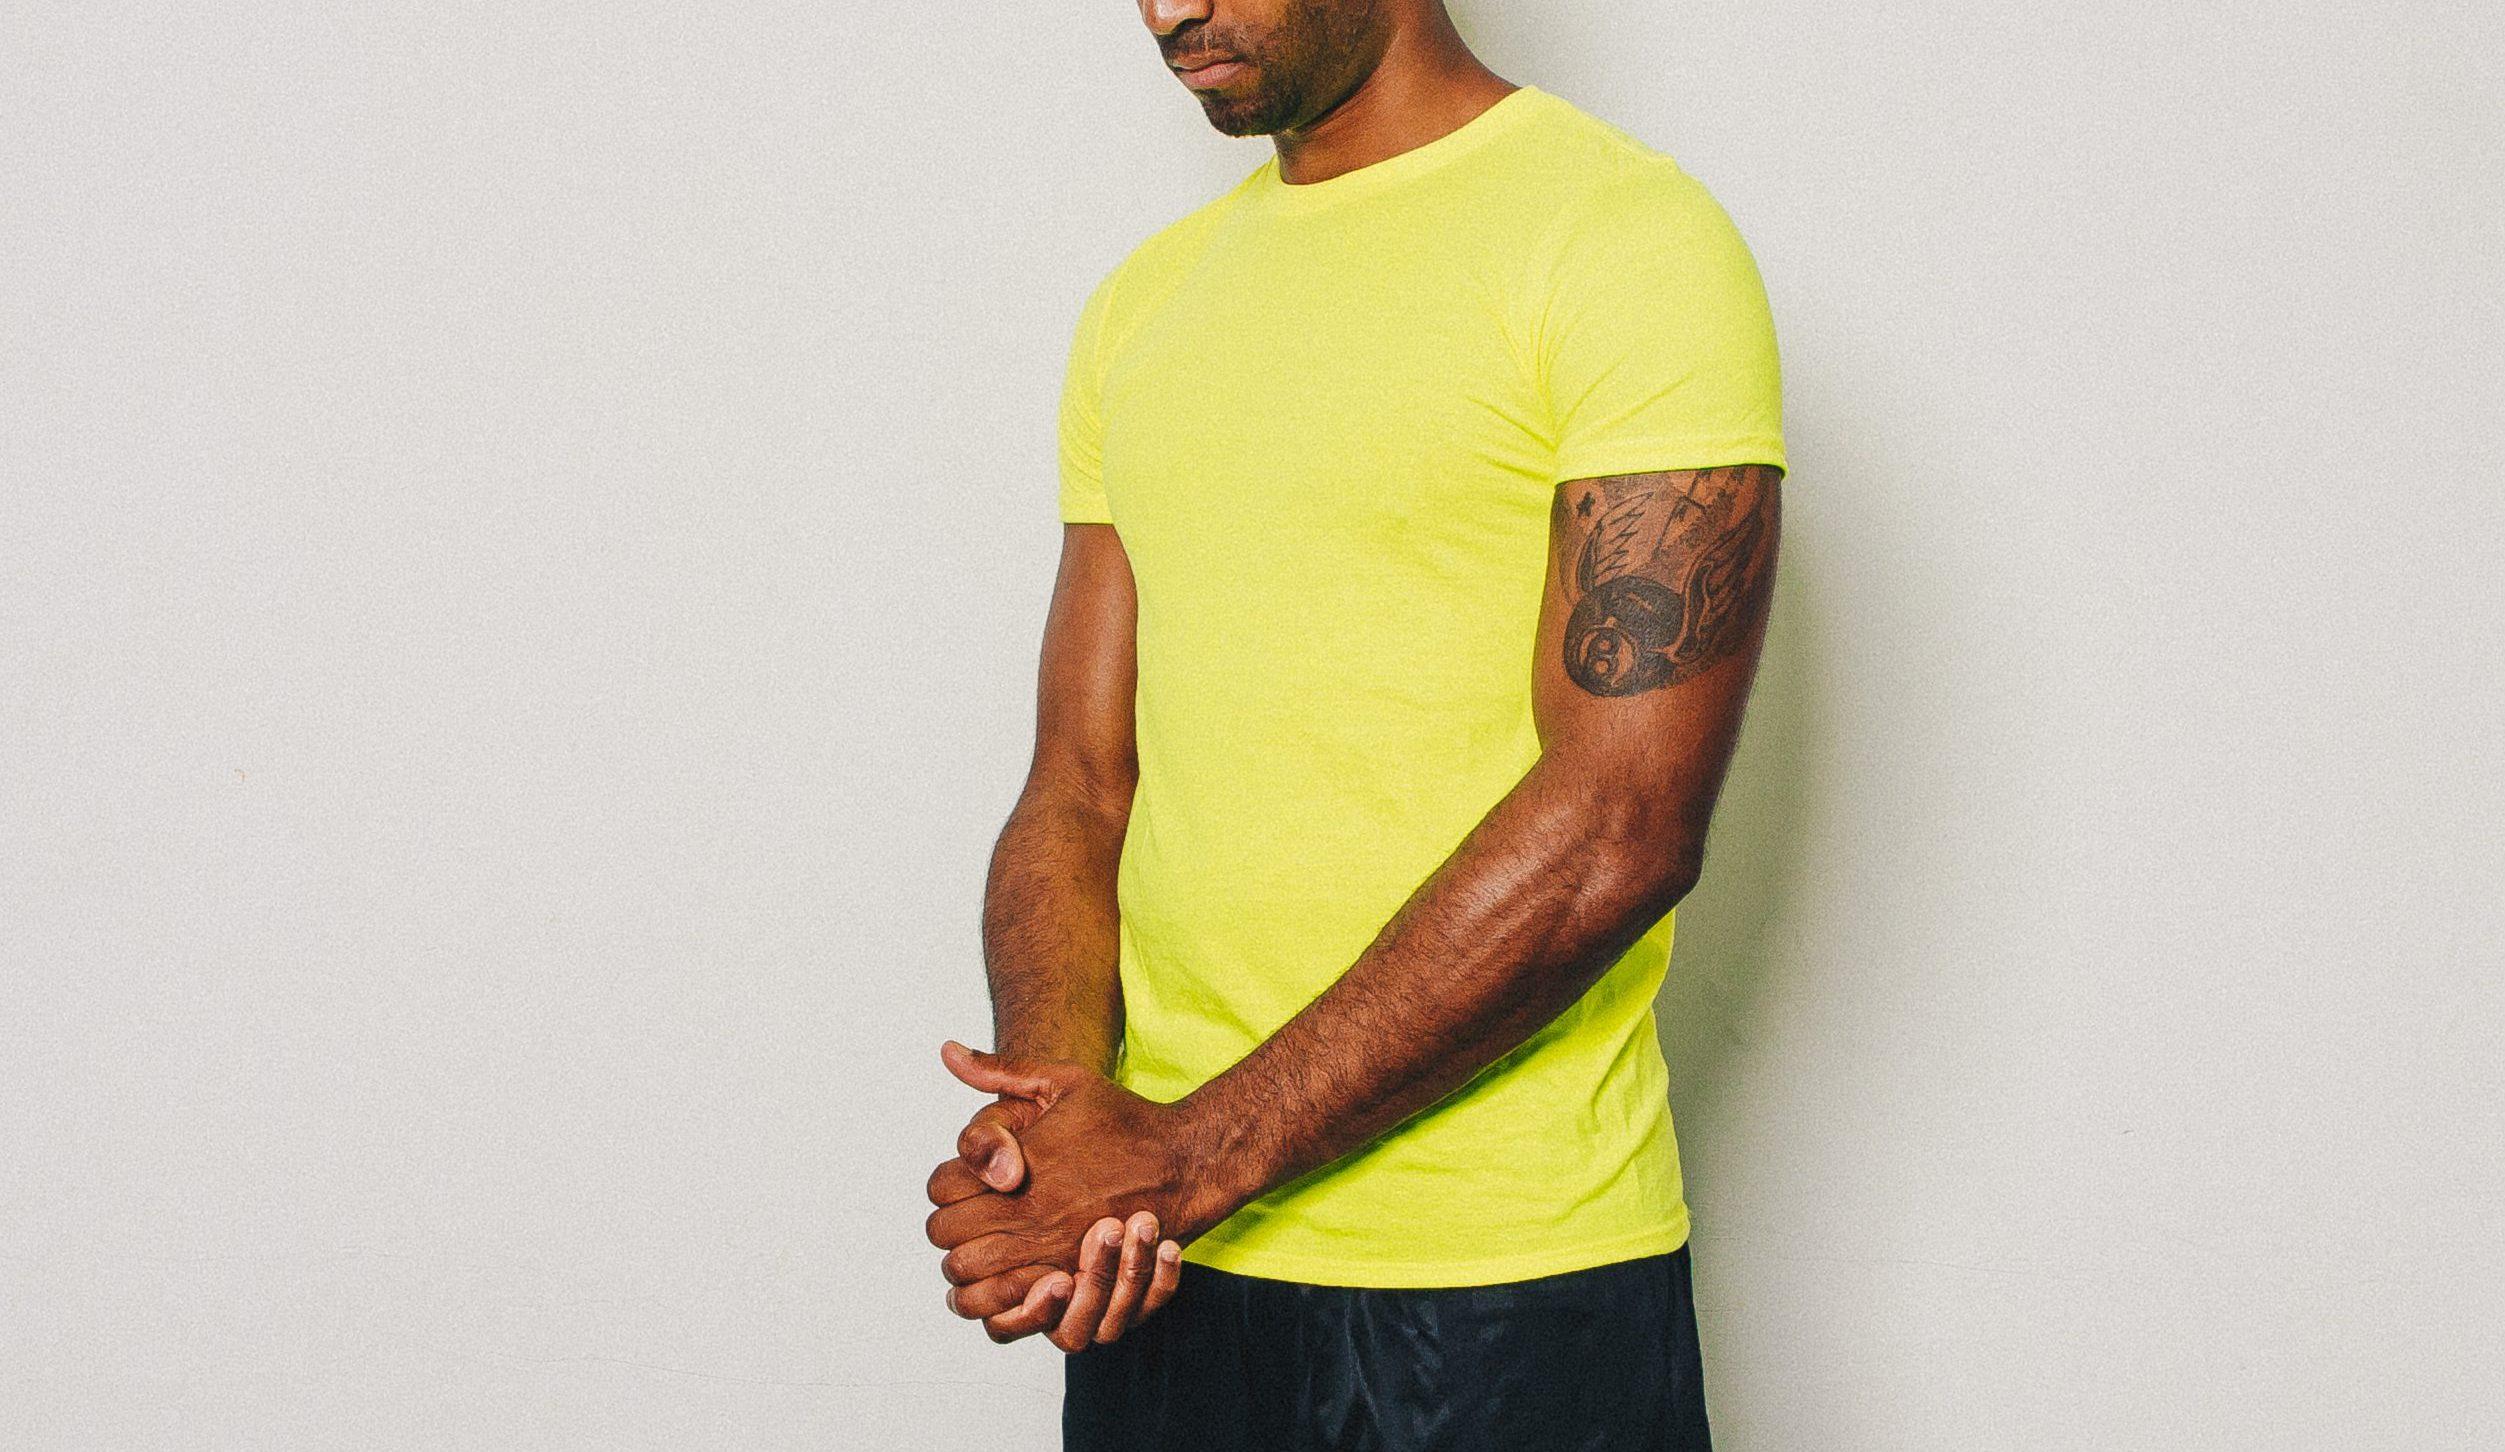 aa16ff9b2 Home>Men's Clothing>T-Shirts>AZ Fitted Lion T-Shirt – Electric Yellow